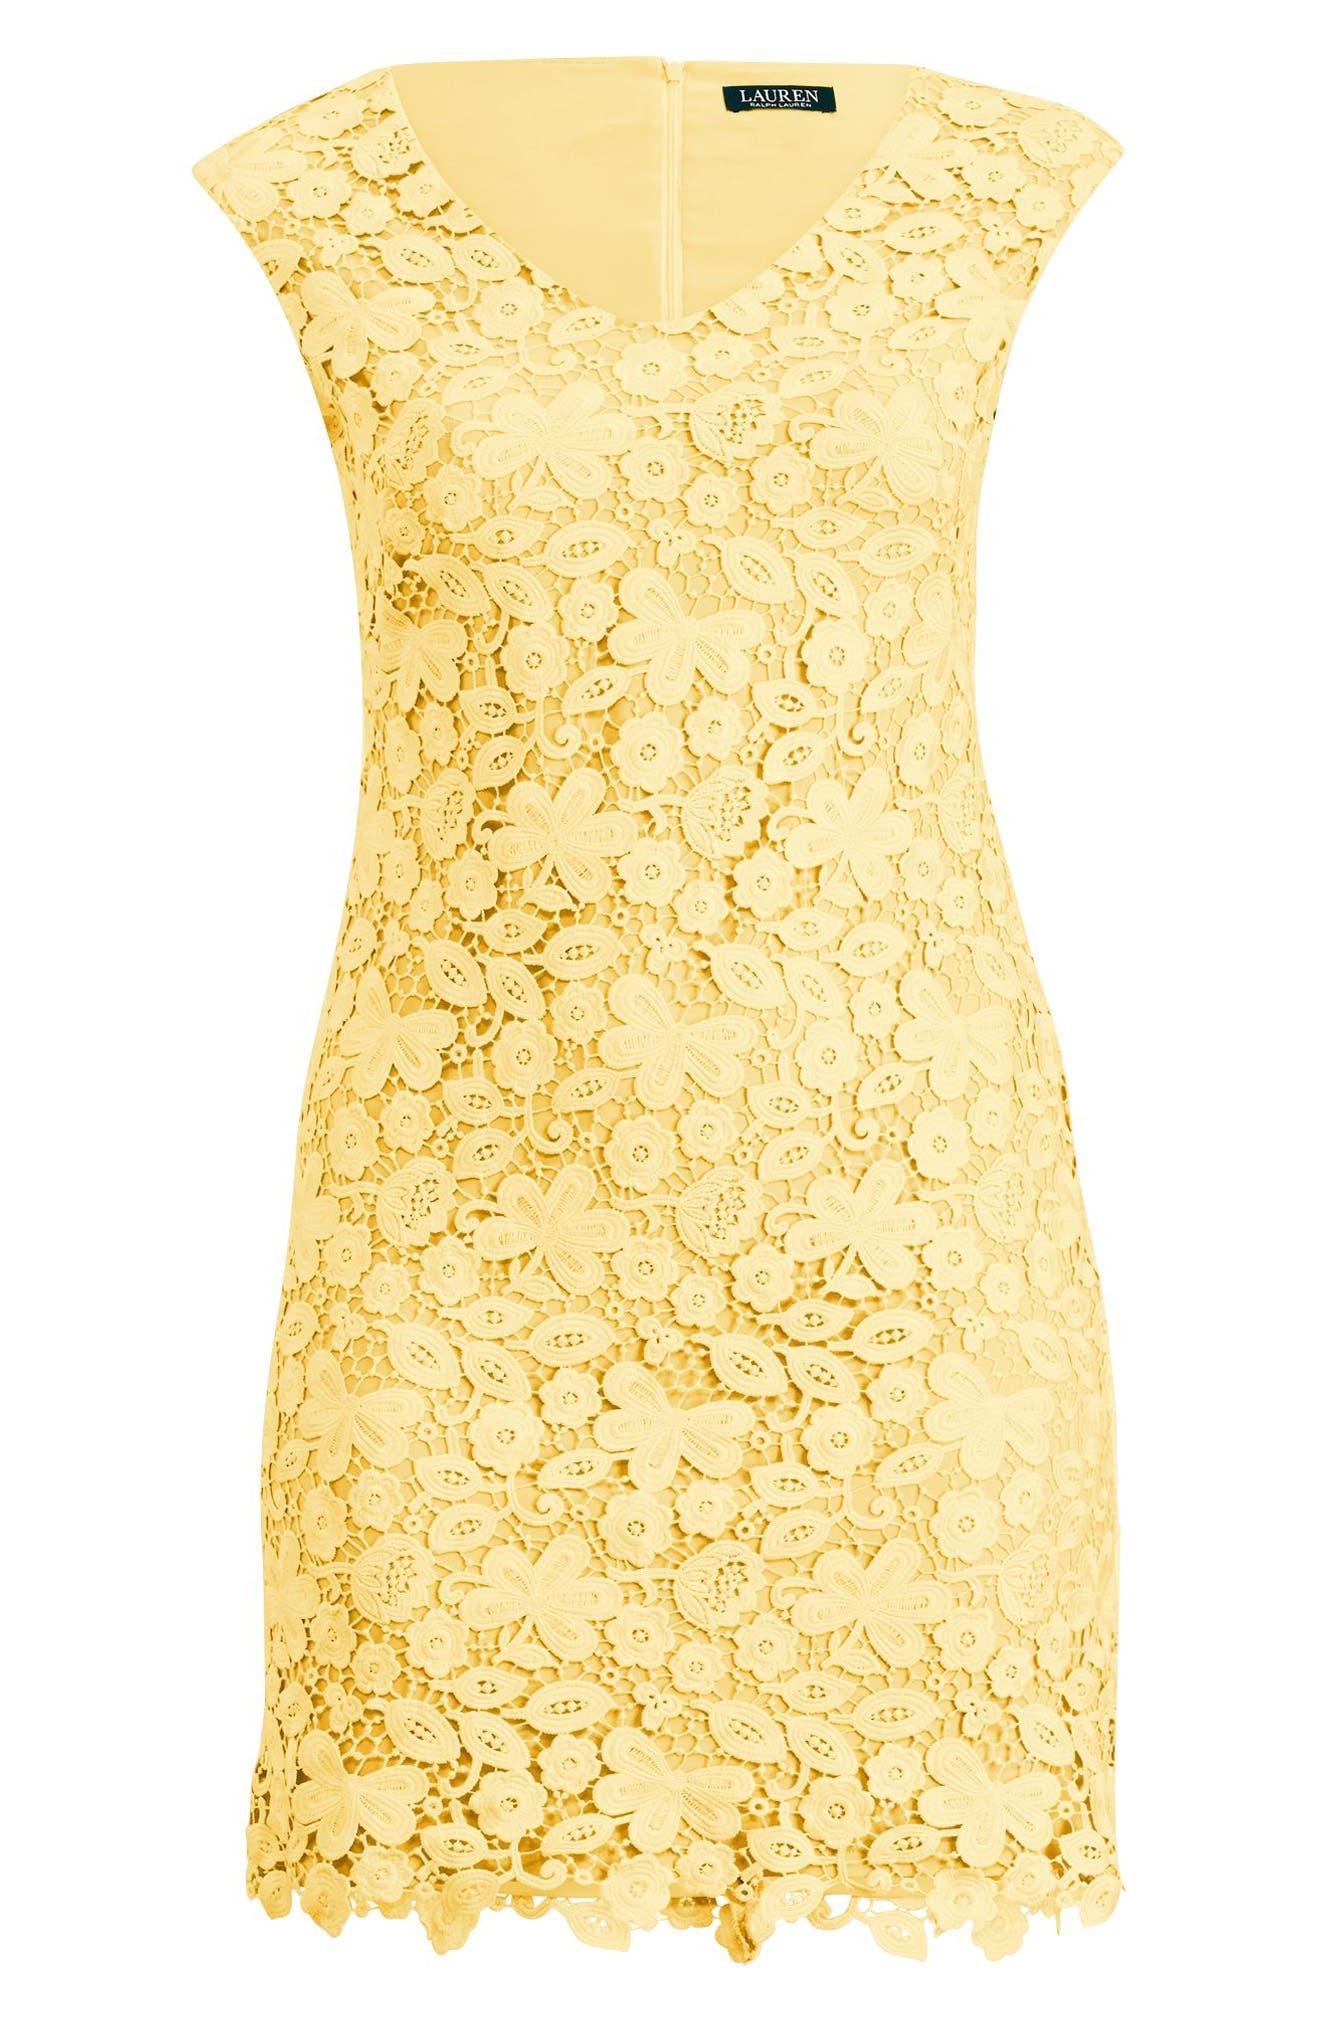 Montie Lace Sheath Dress,                             Alternate thumbnail 3, color,                             Island Yellow